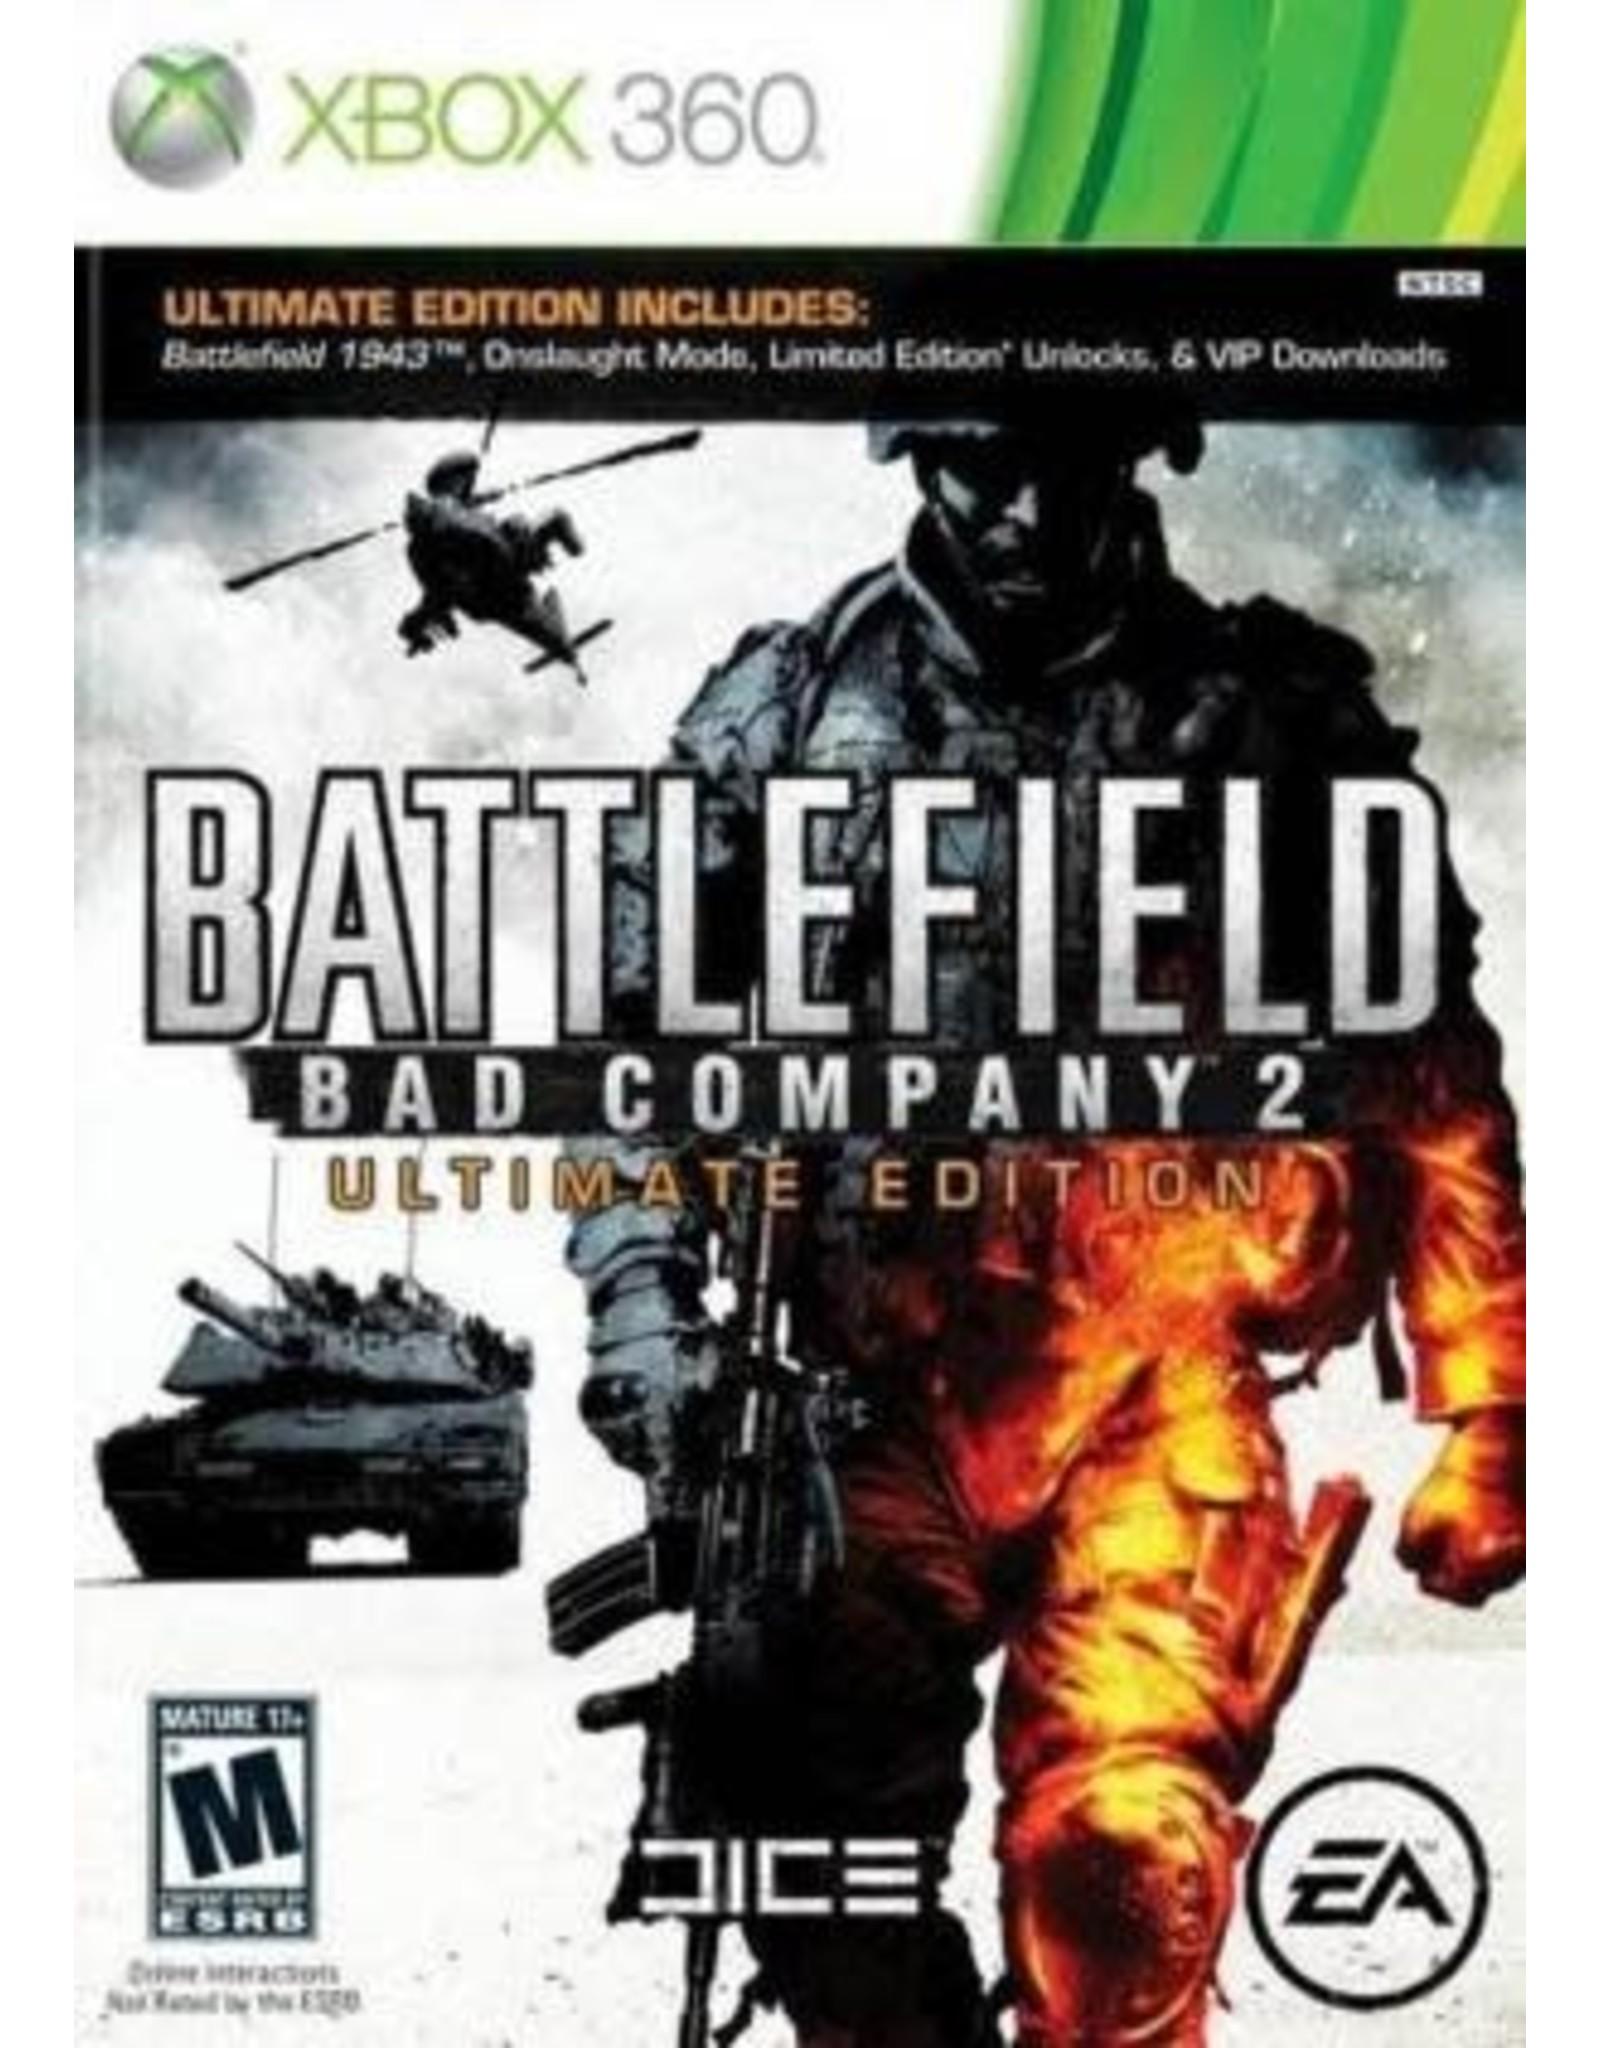 Xbox 360 Battlefield: Bad Company 2 Ultimate Edition